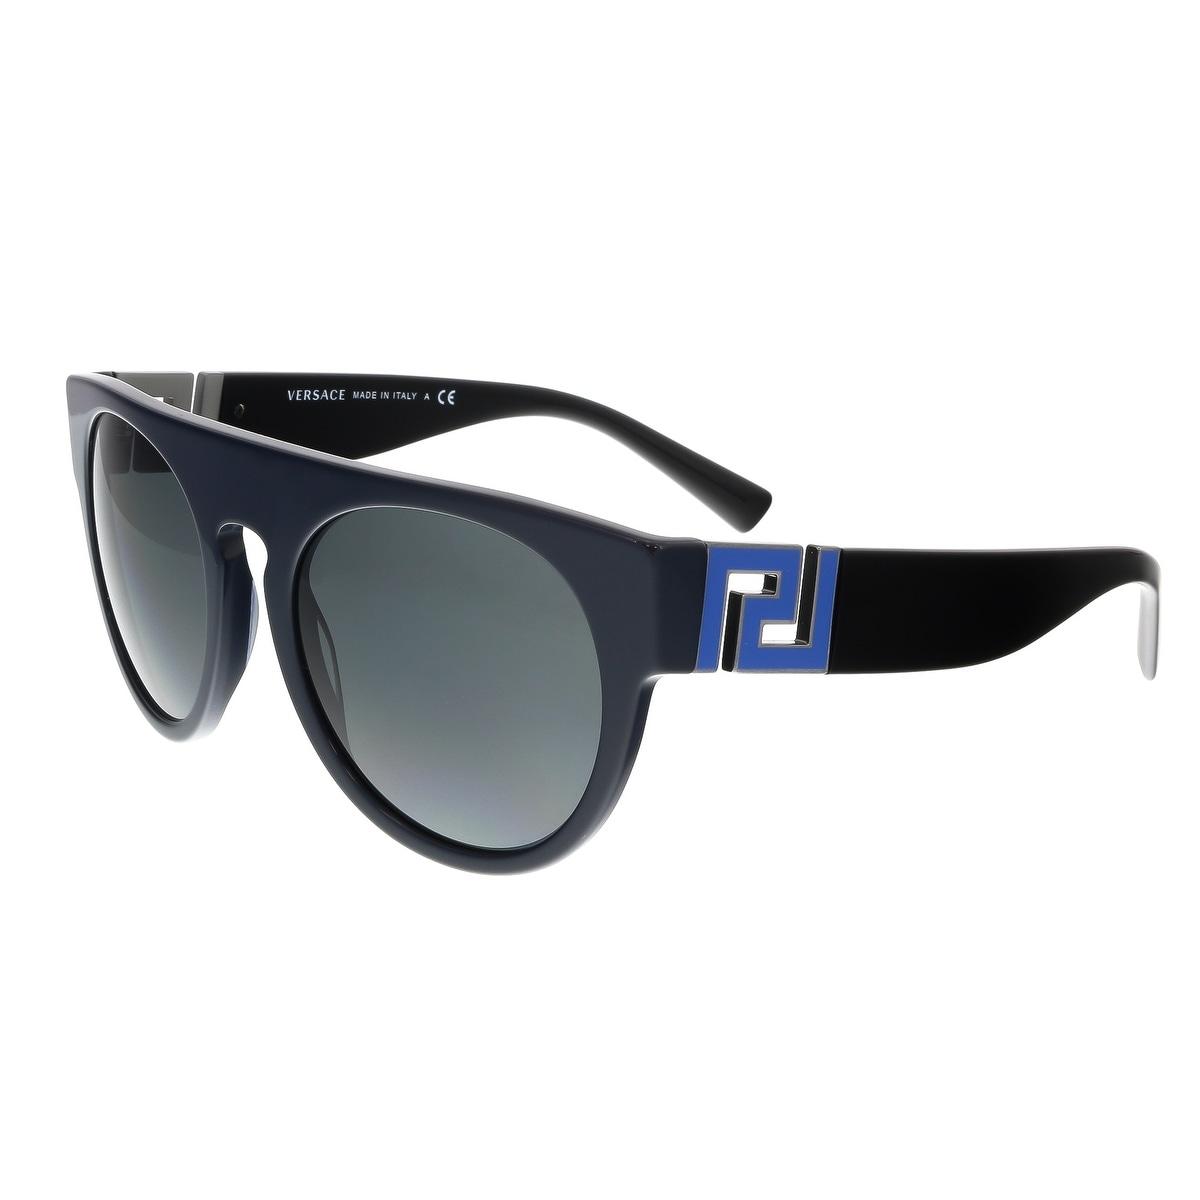 b0319fce200 Versace Men s Sunglasses